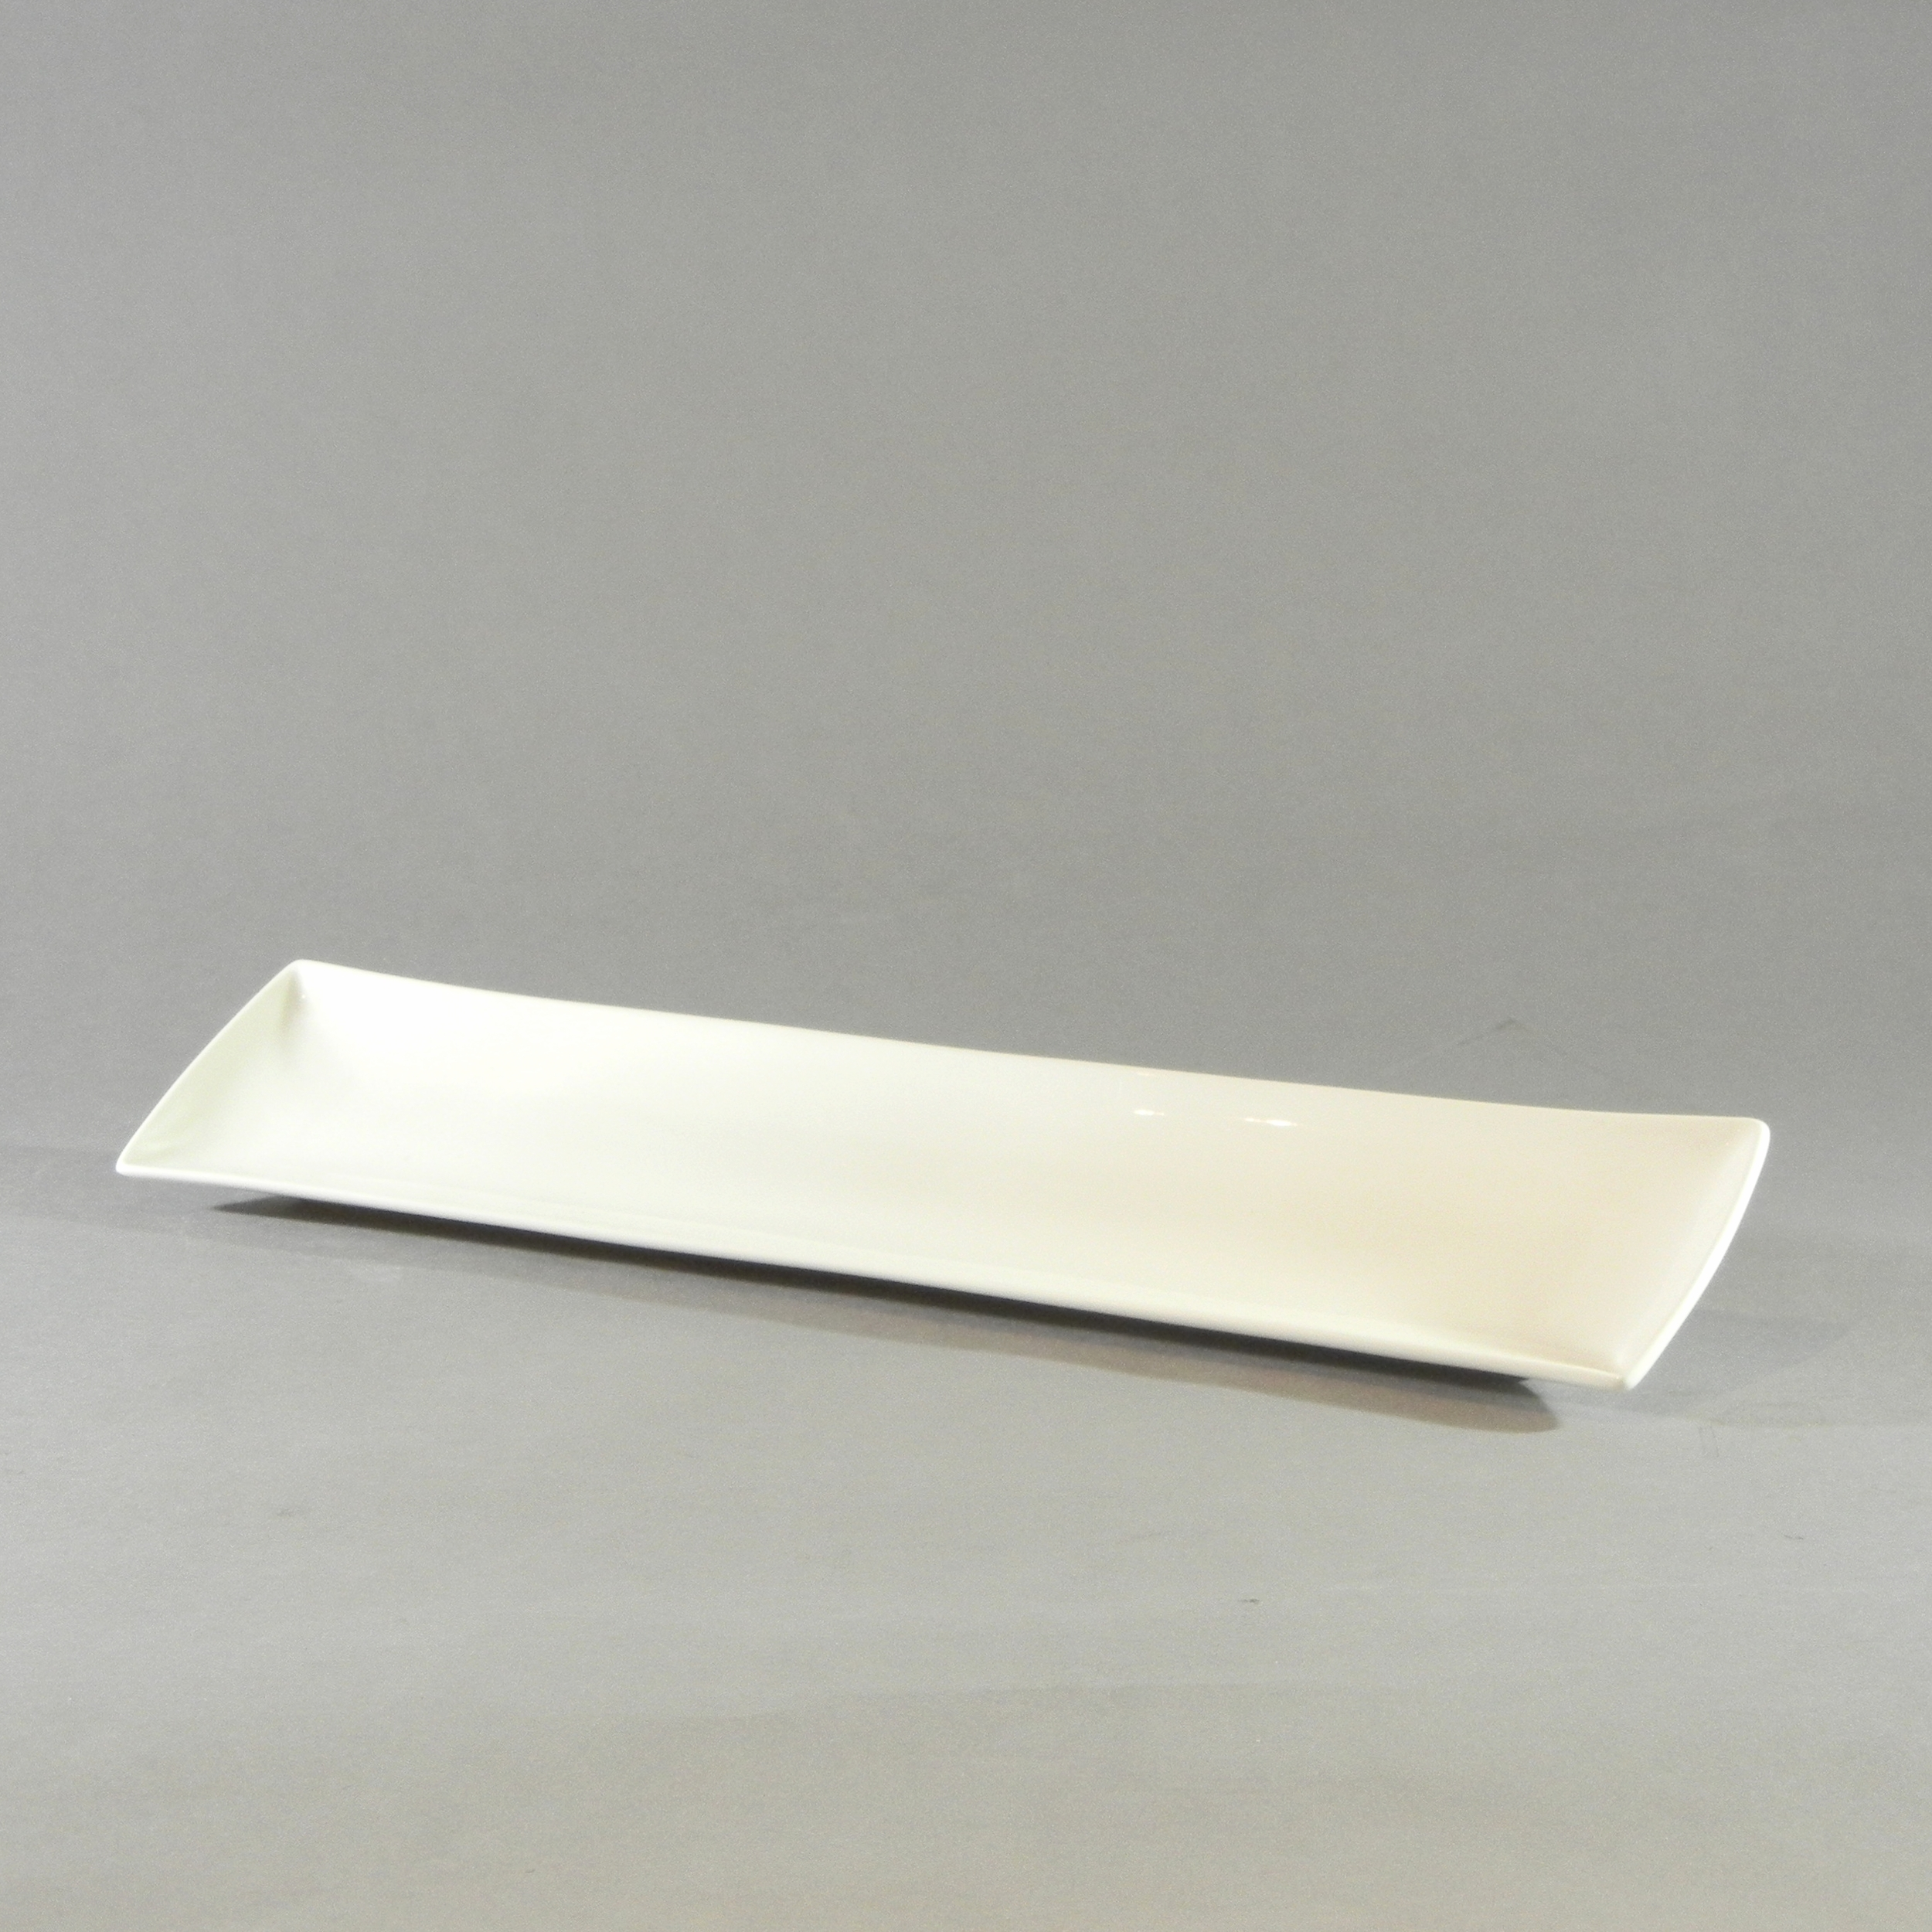 White Rectangular Tray (8''x2.25'')